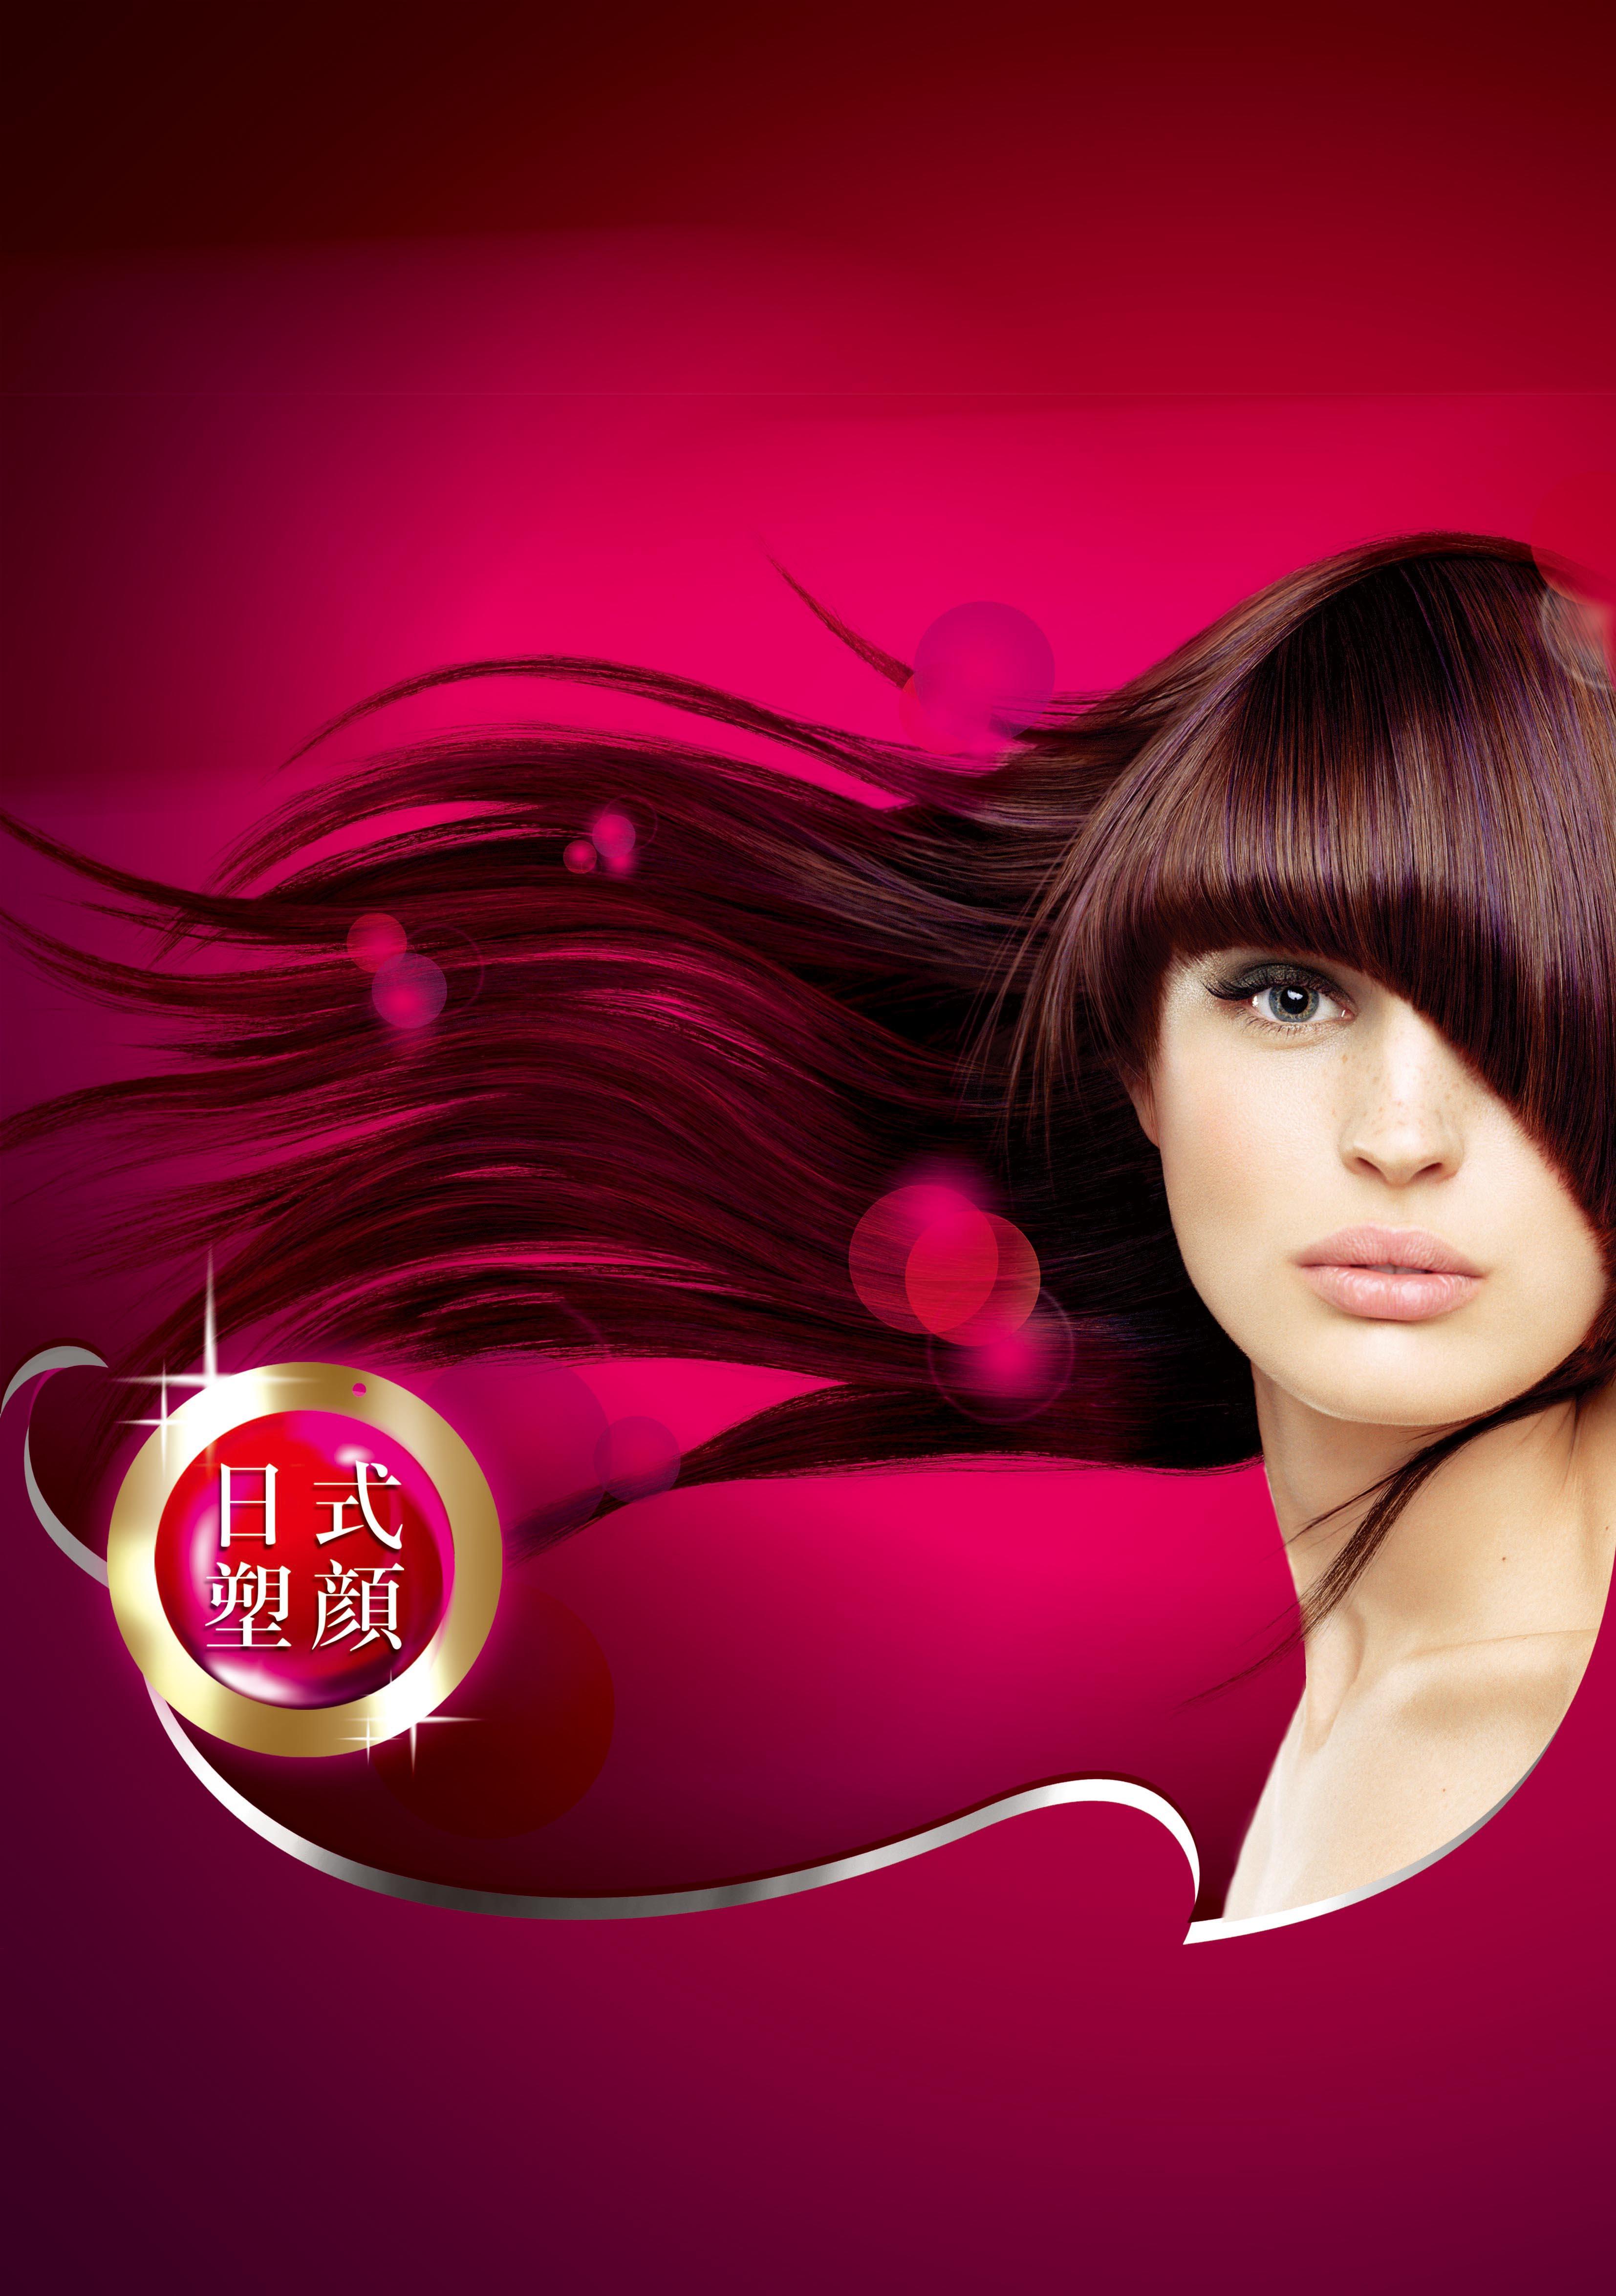 beauty background  beauty  salons  purple background image